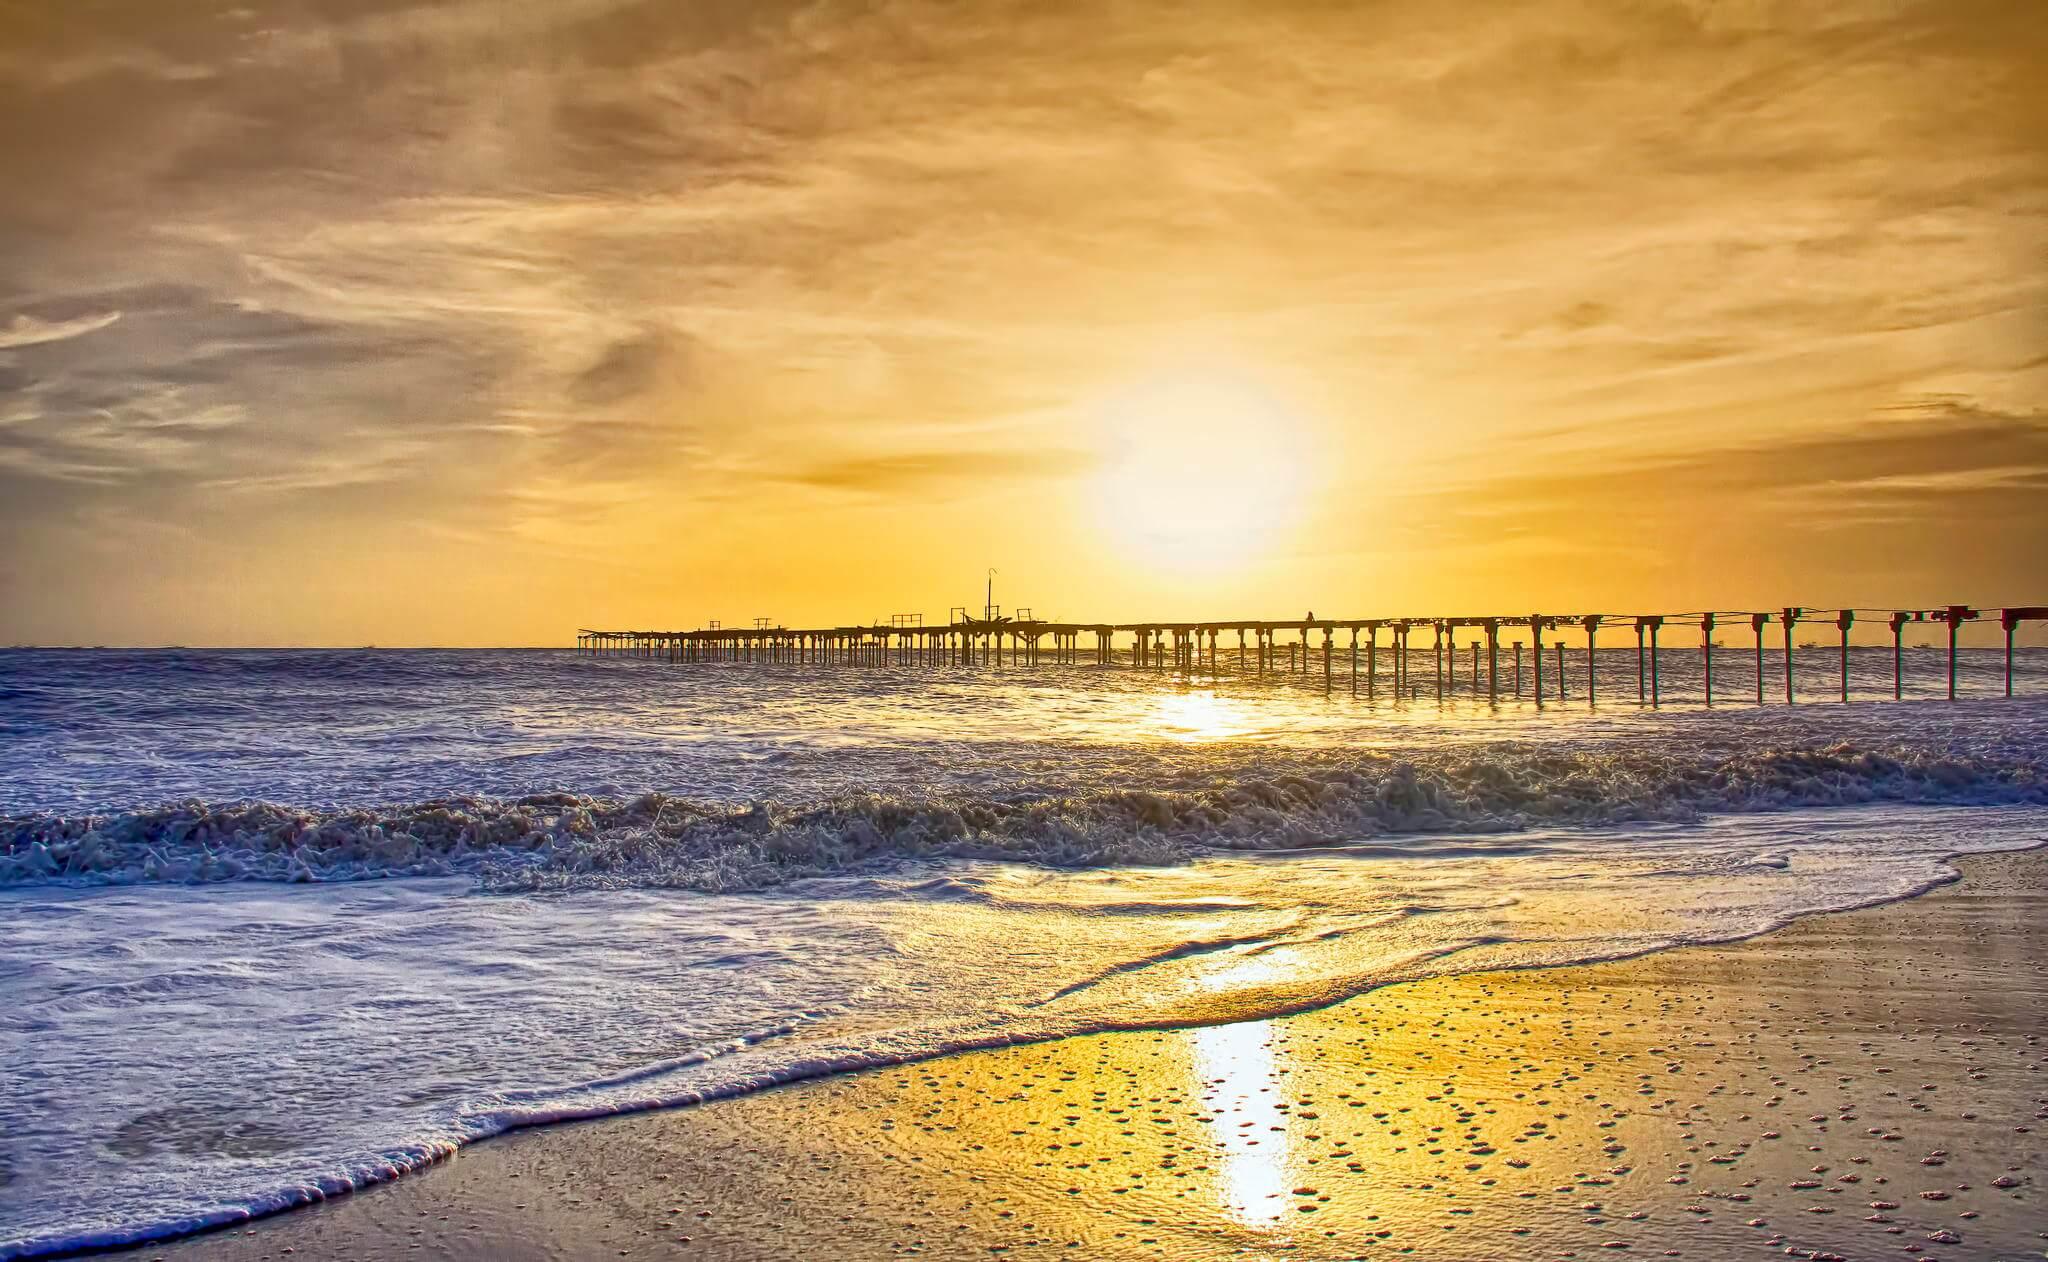 sunset behind a pier at Alleppey beach